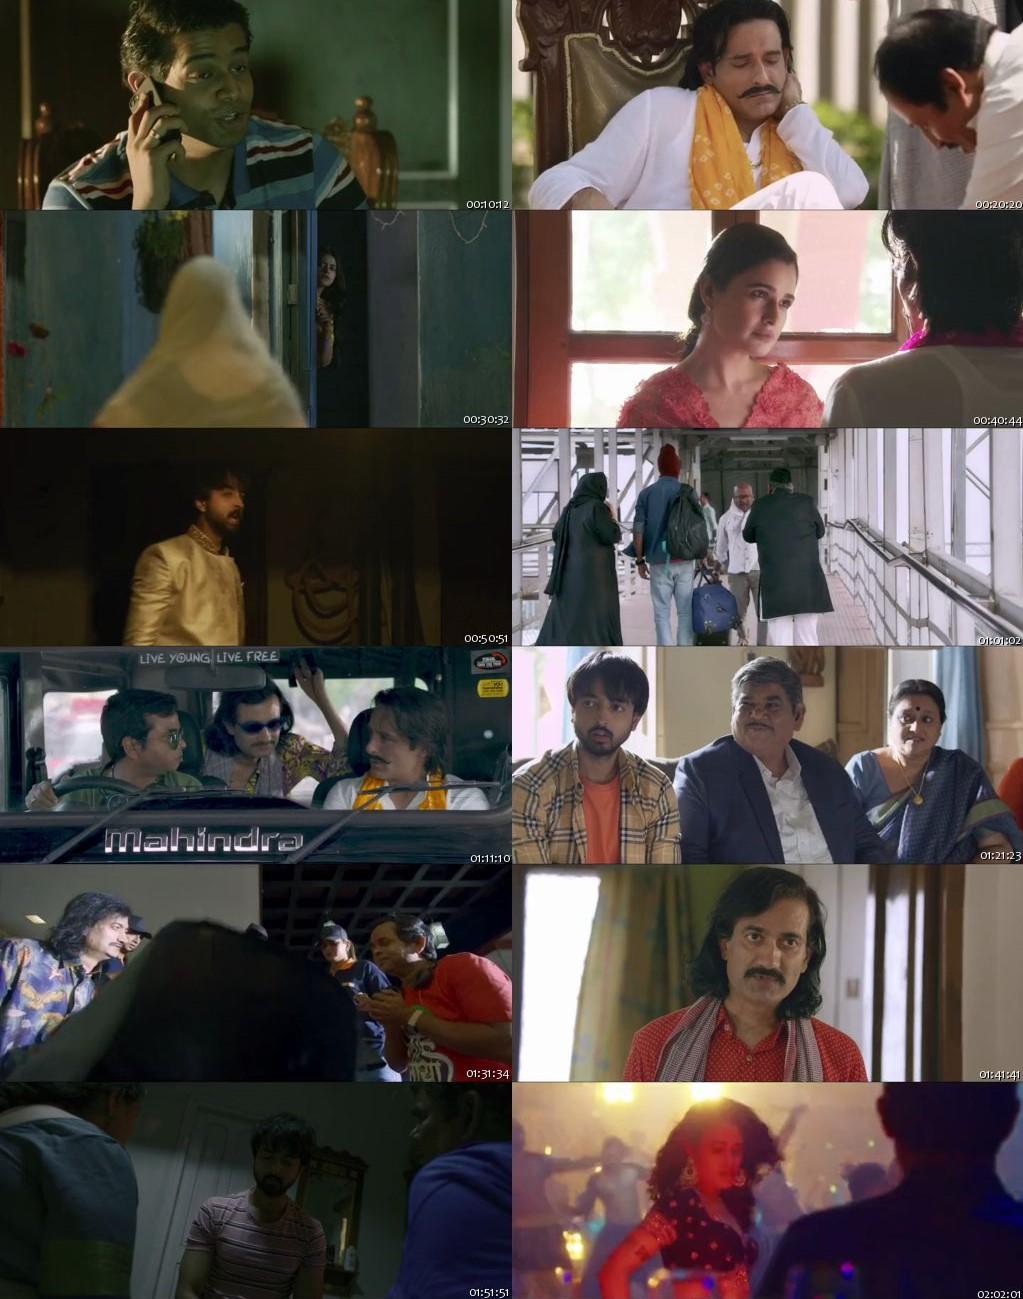 Sab Kushal Mangal 2020 Full Hindi Movie Online Watch HDRip 480p 300Mb